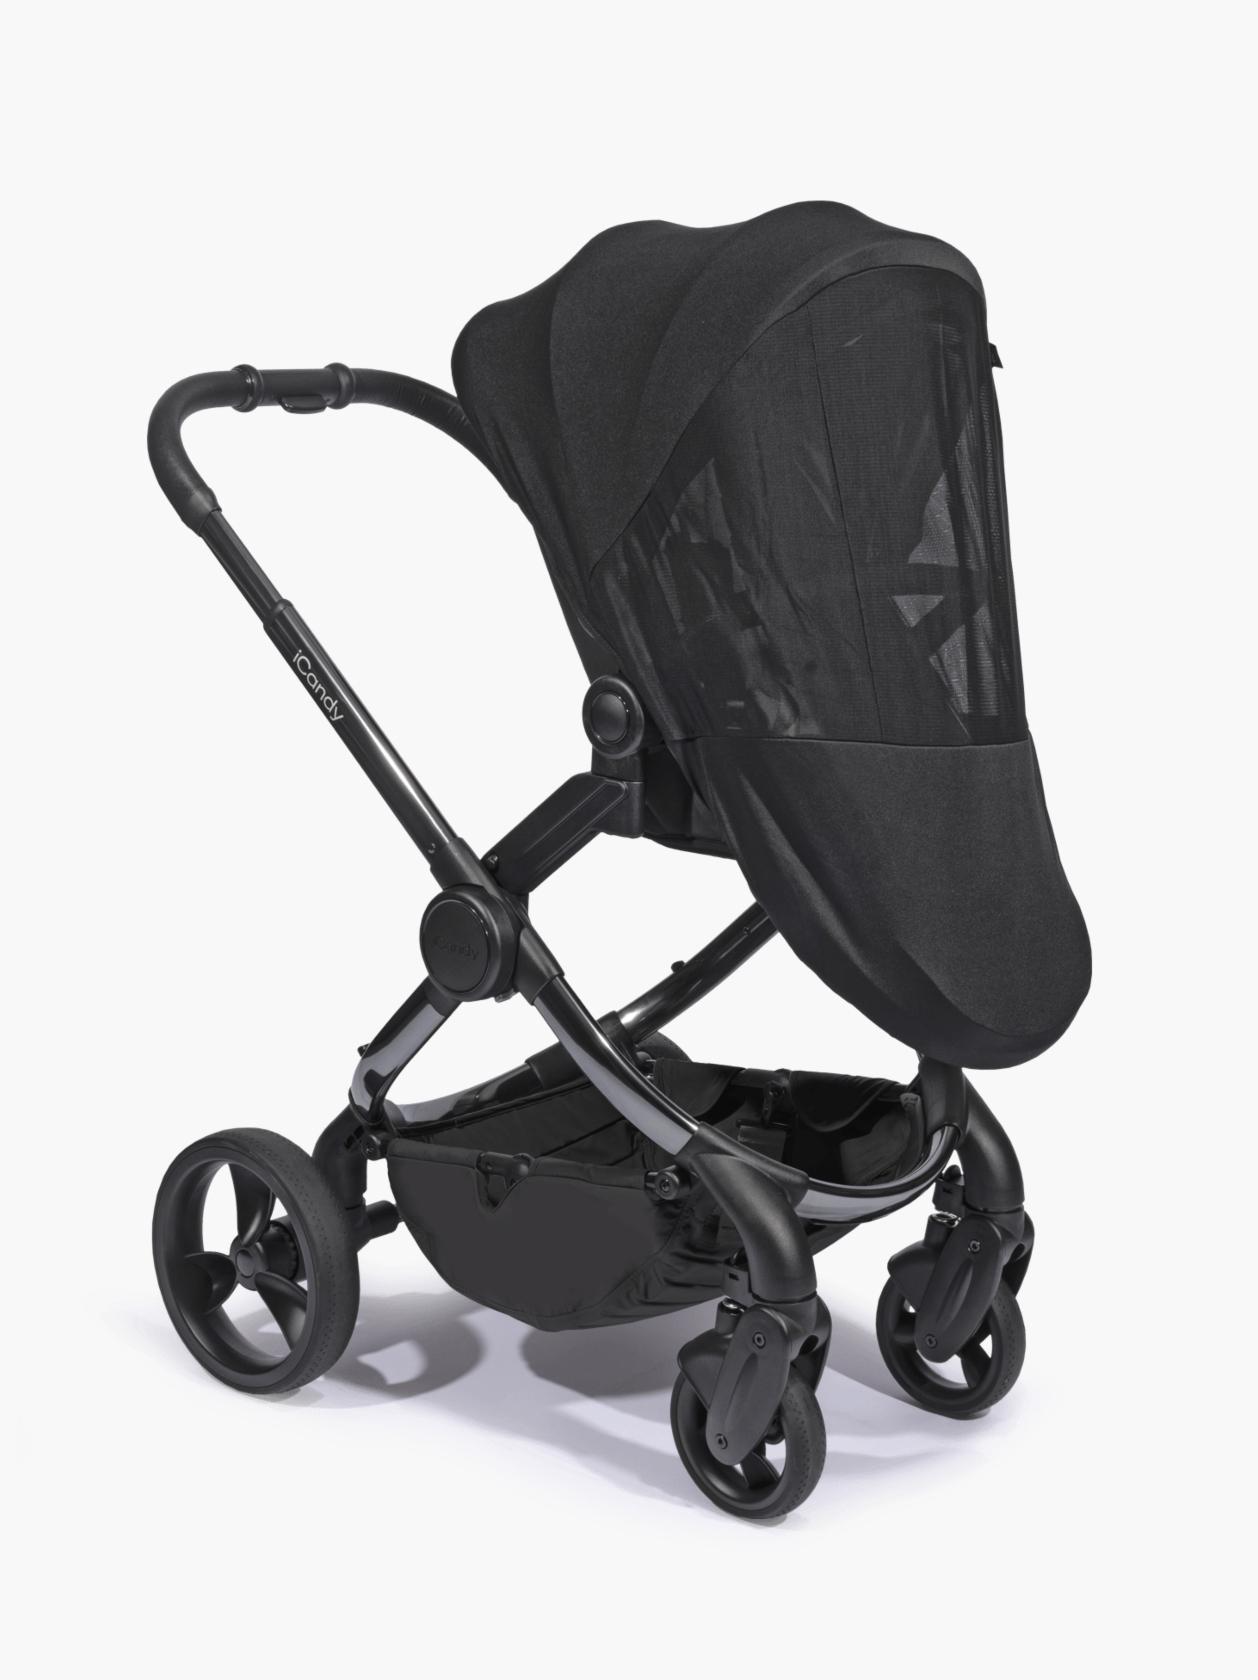 Cerium Pushchair and Carrycot - Complete Bundle